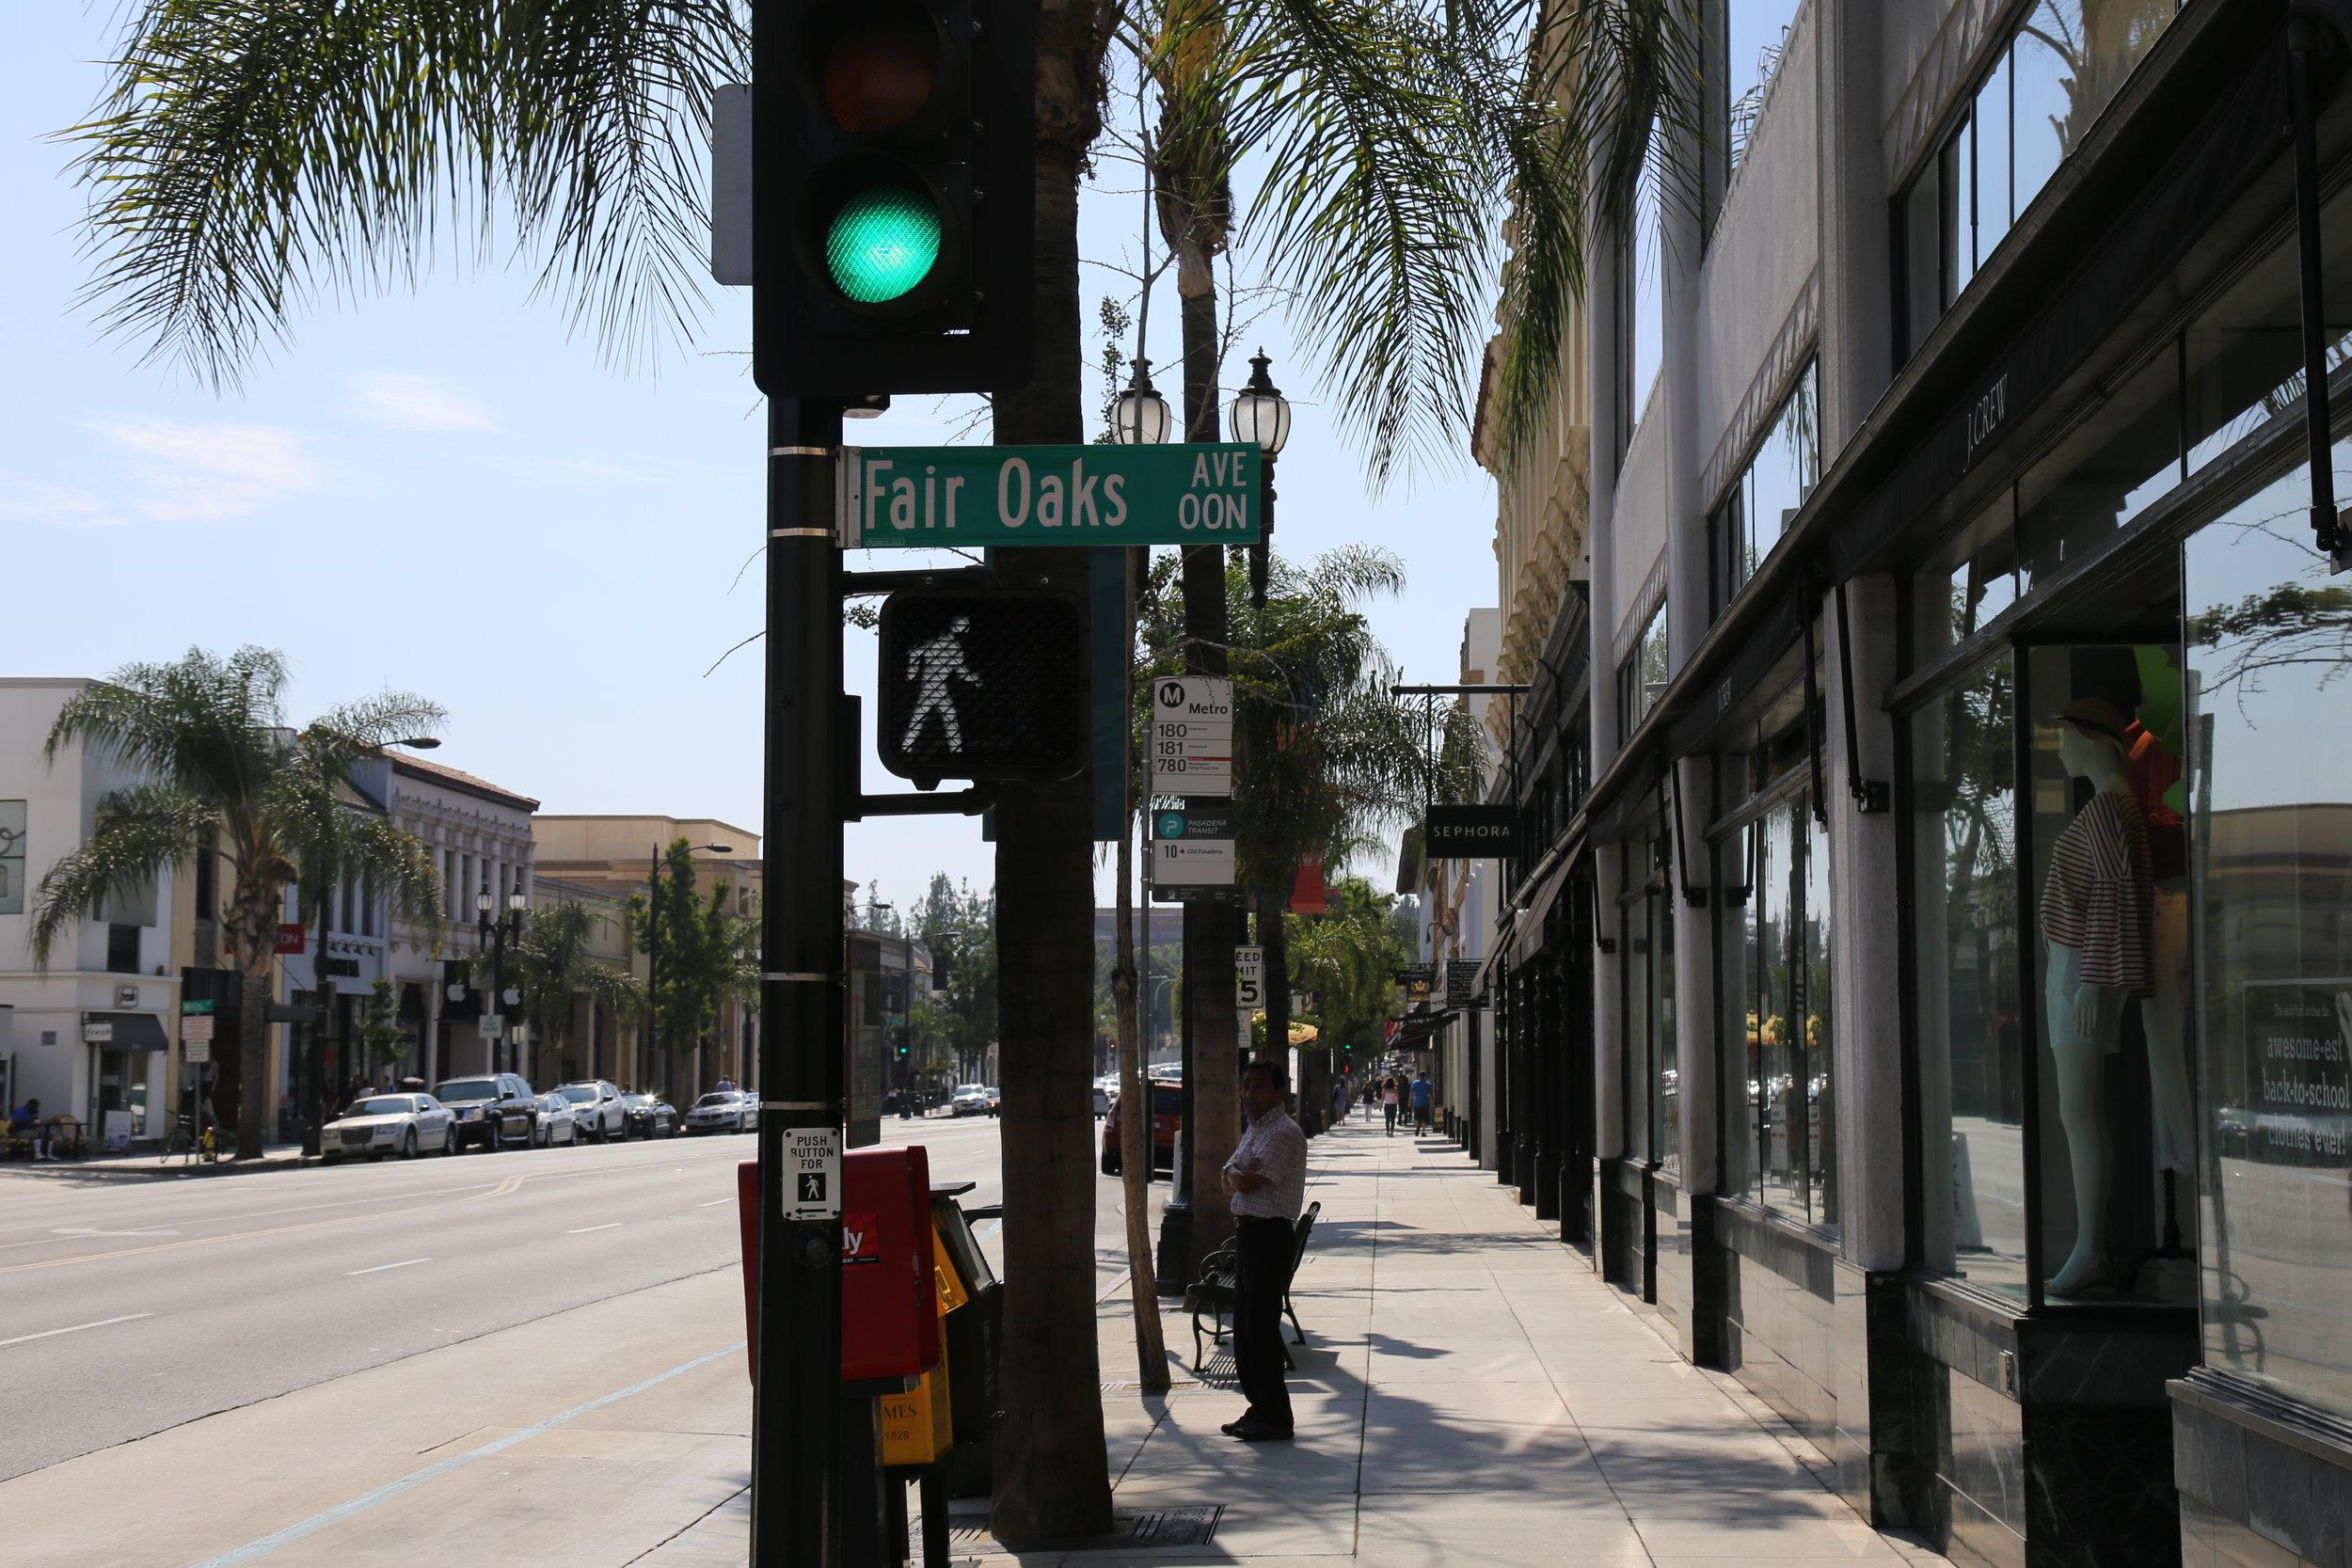 780 stop in Old Town Pasadena